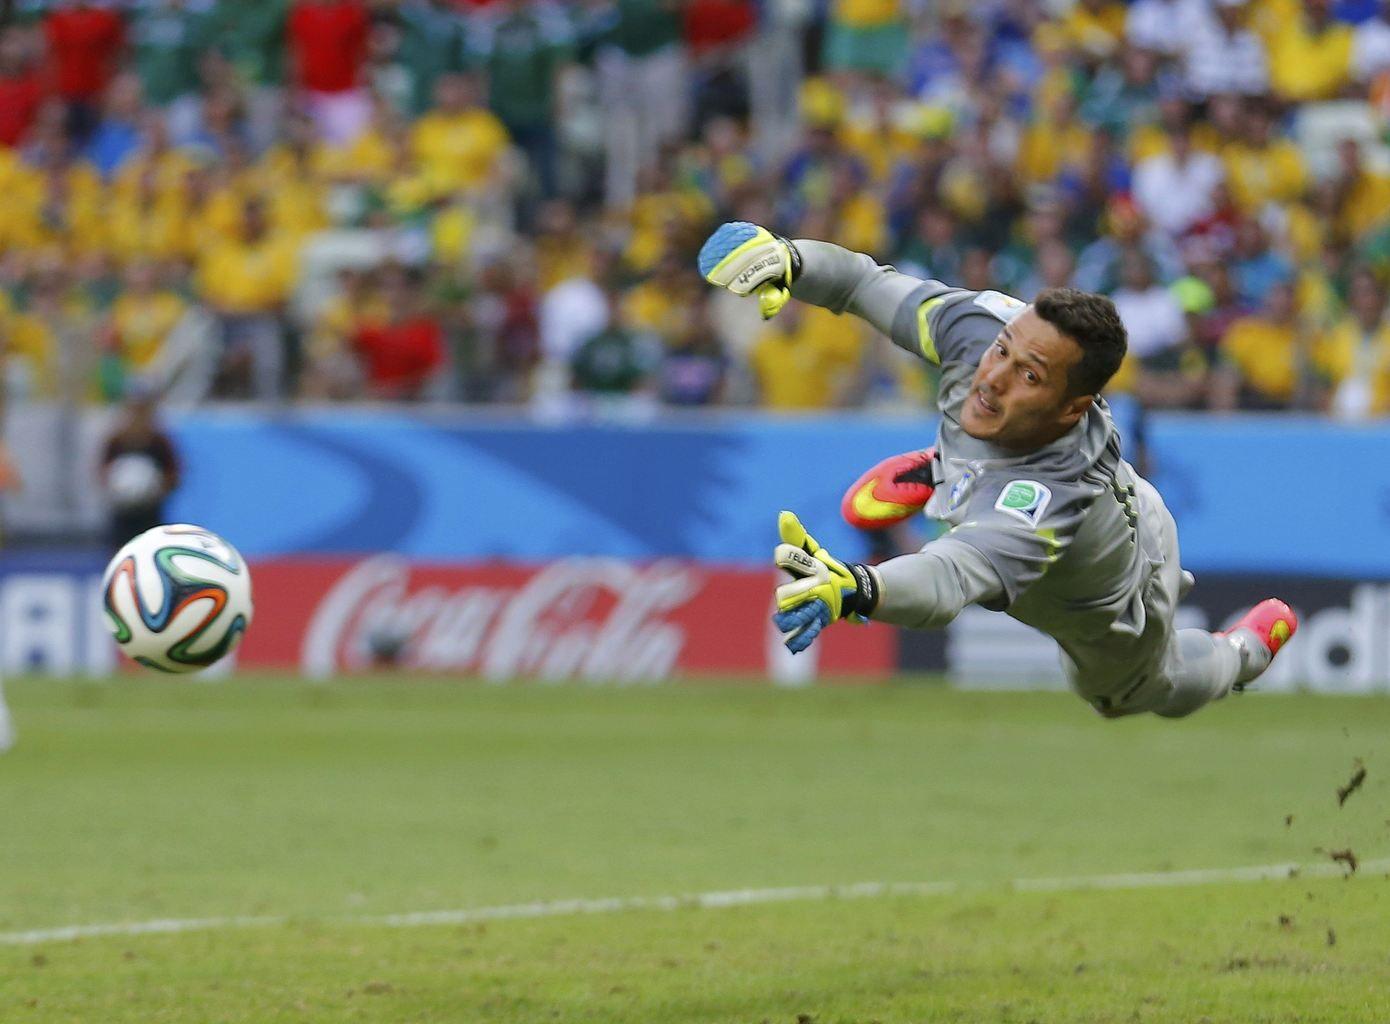 Brazil's goalkeeper Julio Cesar dives for the ball during